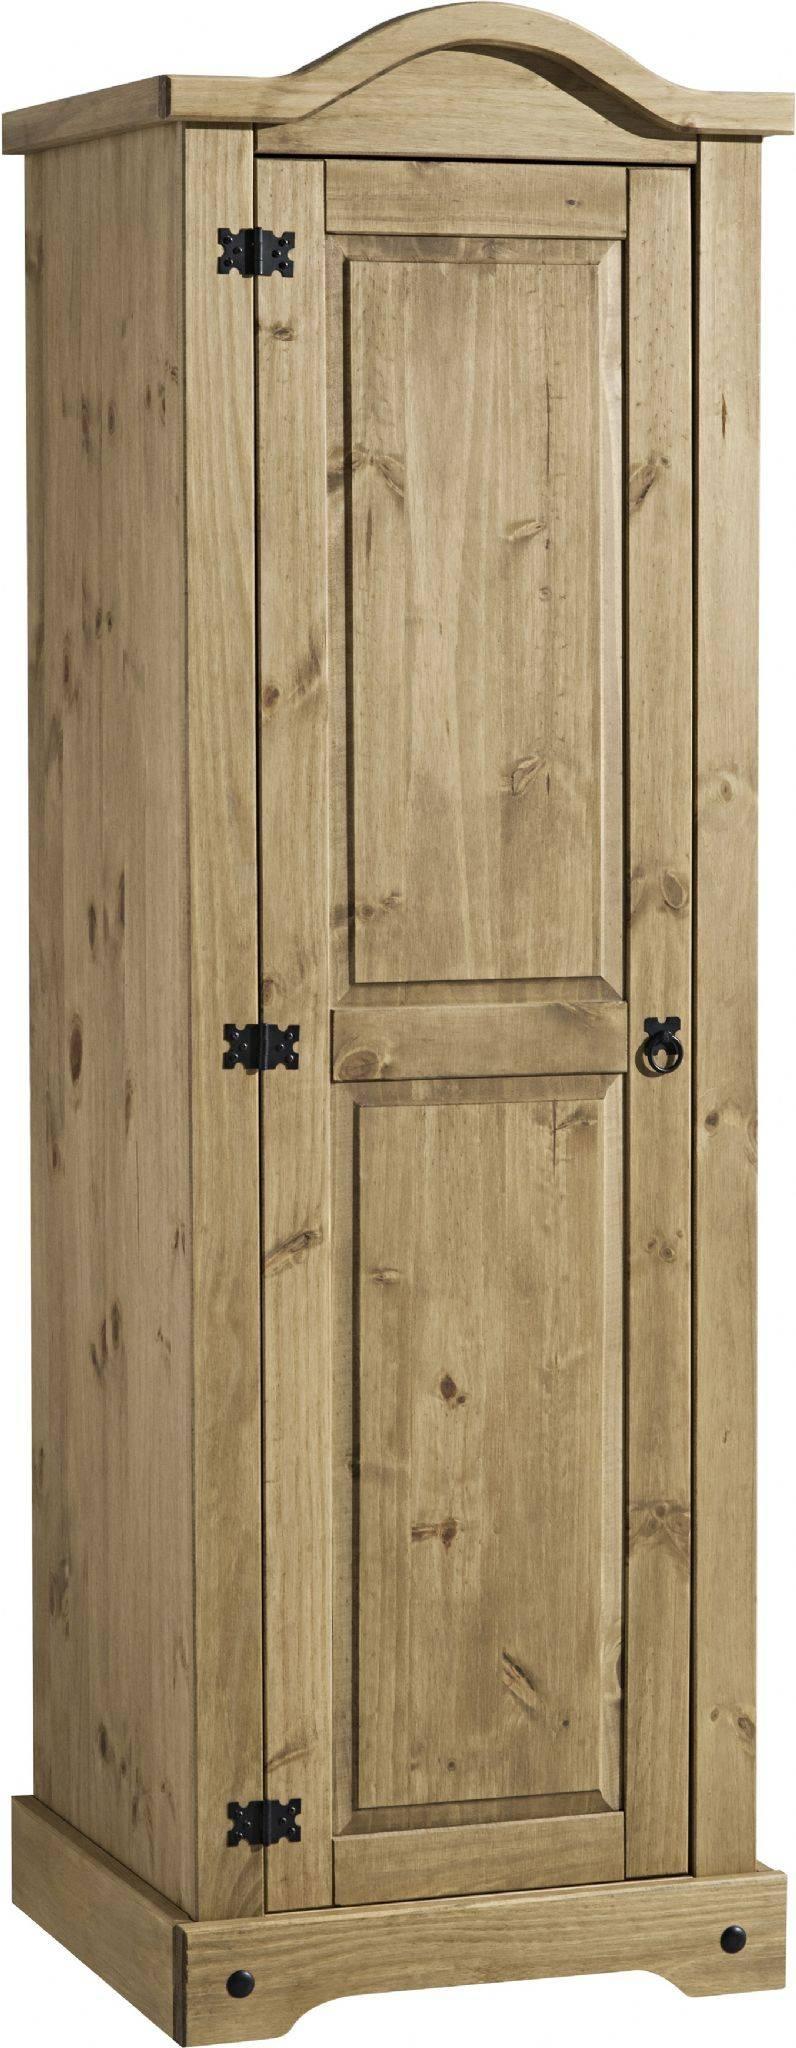 Wardrobe : 37 Shocking One Door Wardrobe With Drawers Image Regarding Single Door Mirrored Wardrobes (View 12 of 15)